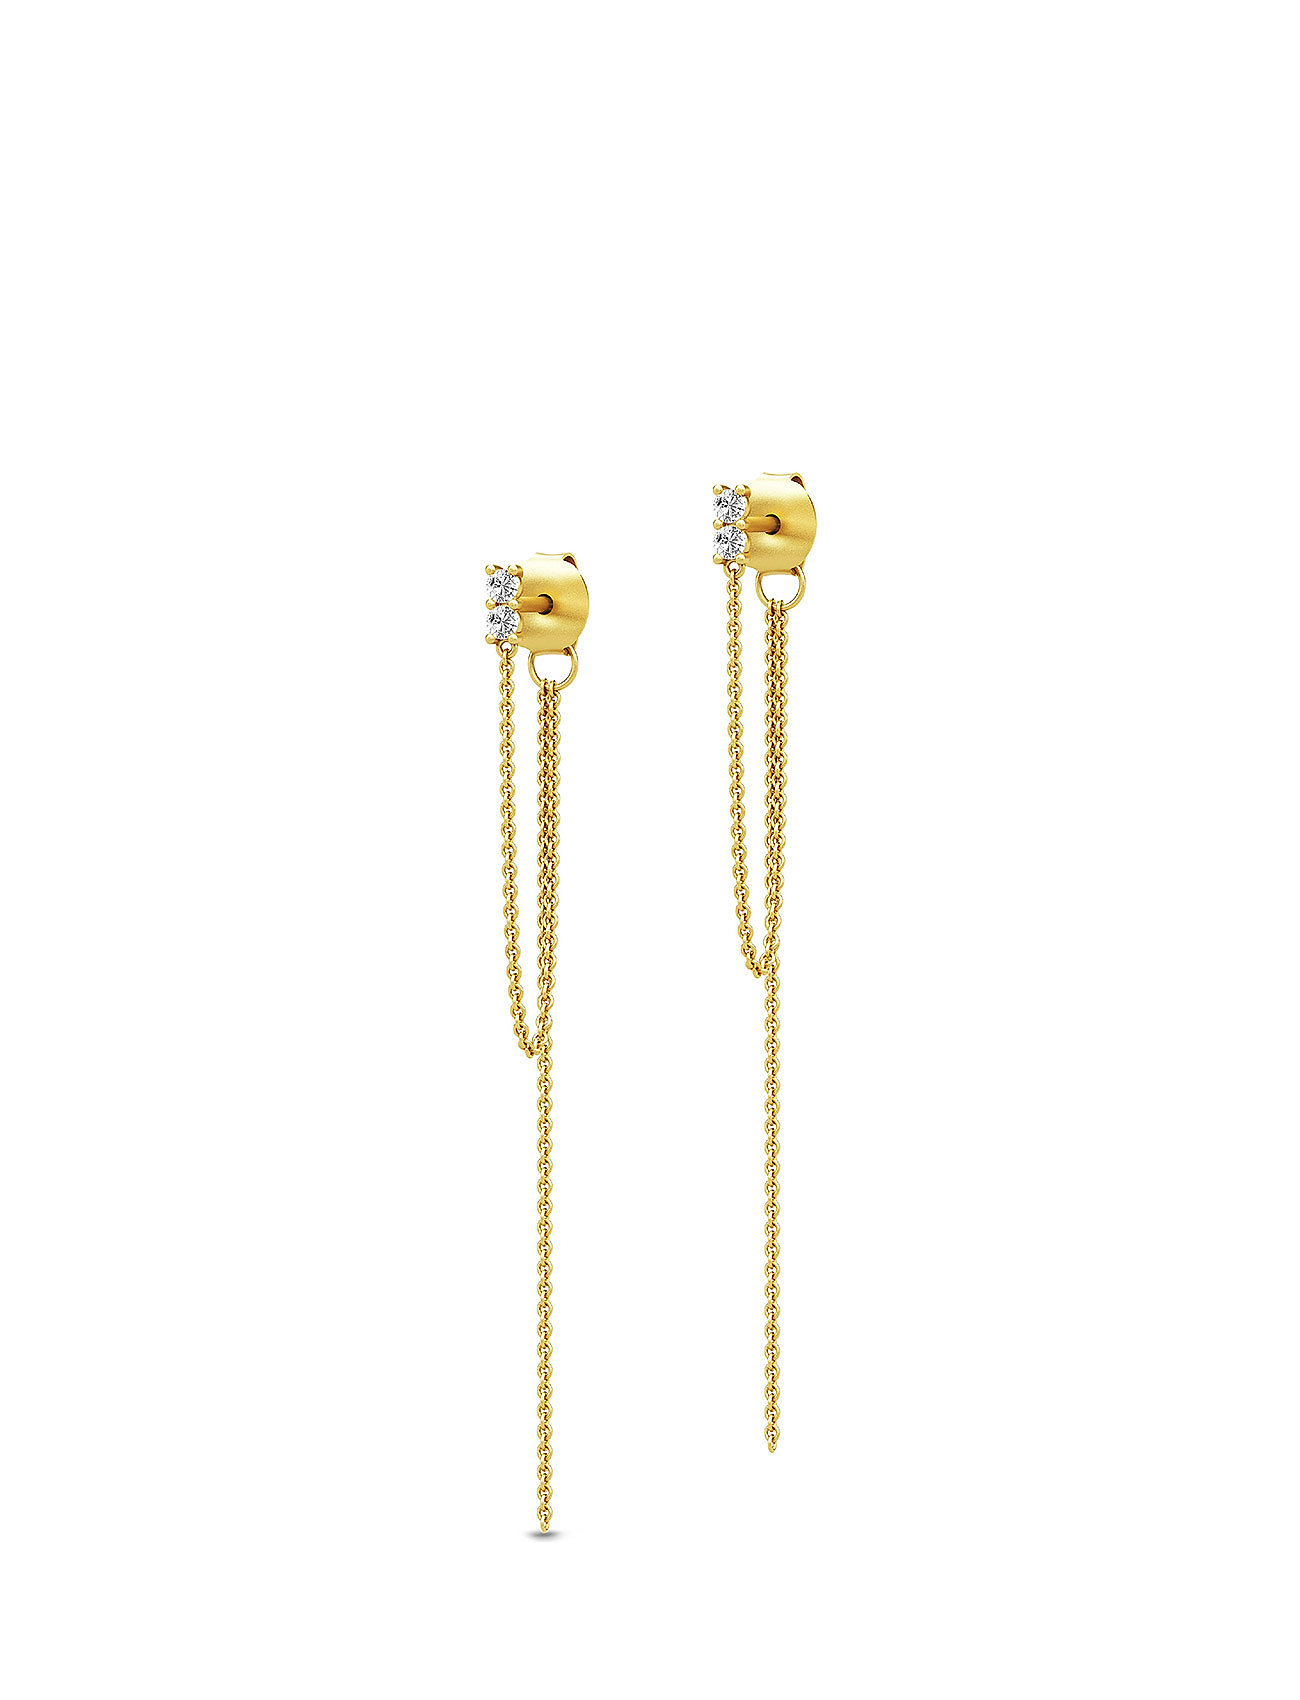 Julie Sandlau Lucia Chain Earstuds - Gold - GOLD